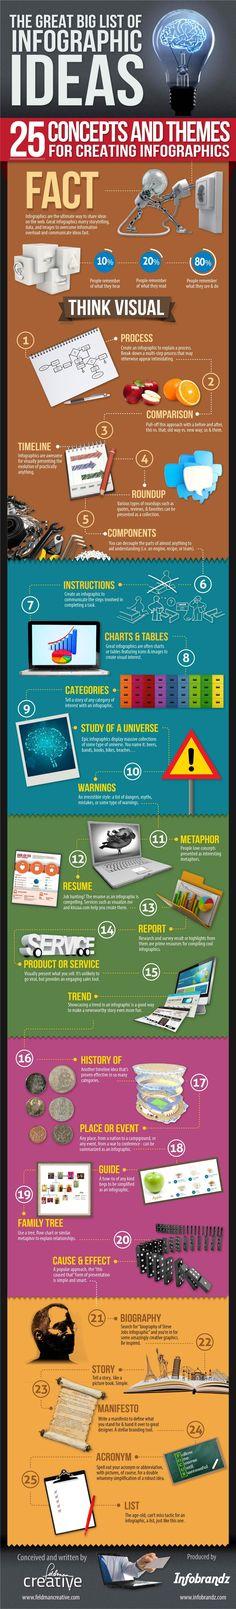 The Great Big List of #Infographics Ideas by Barry Feldman via slideshare